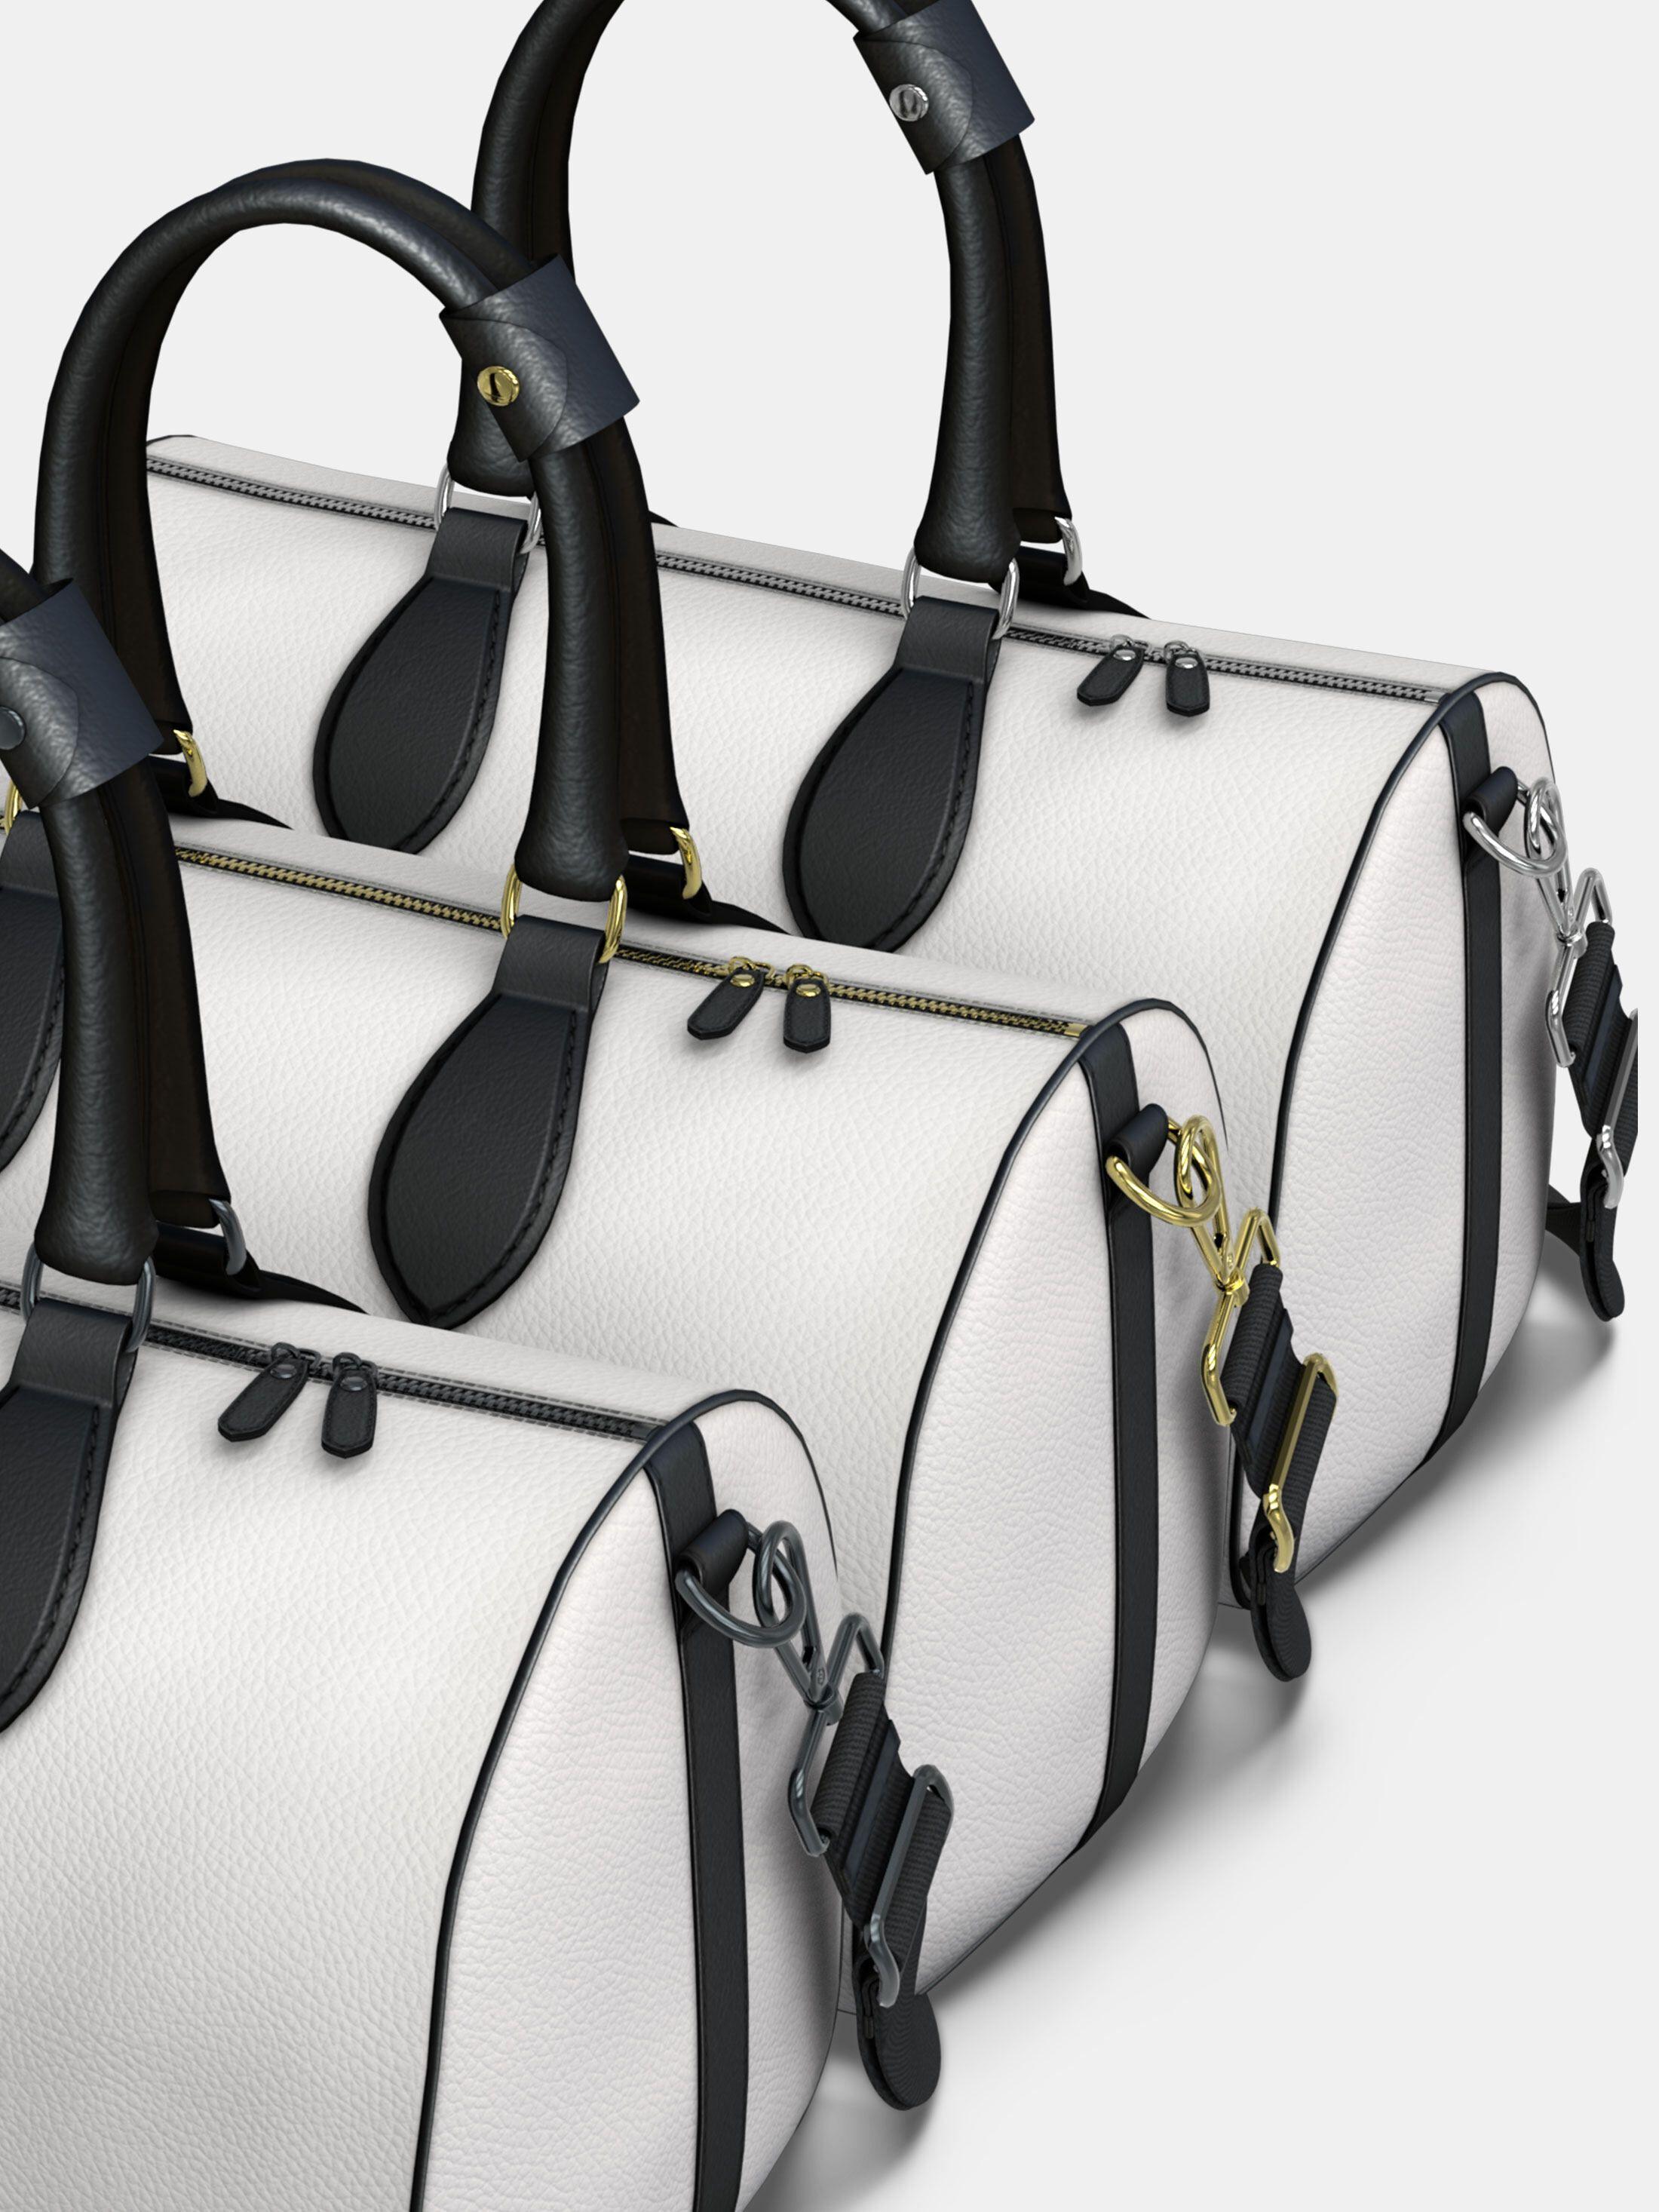 design your own duffle bag uk